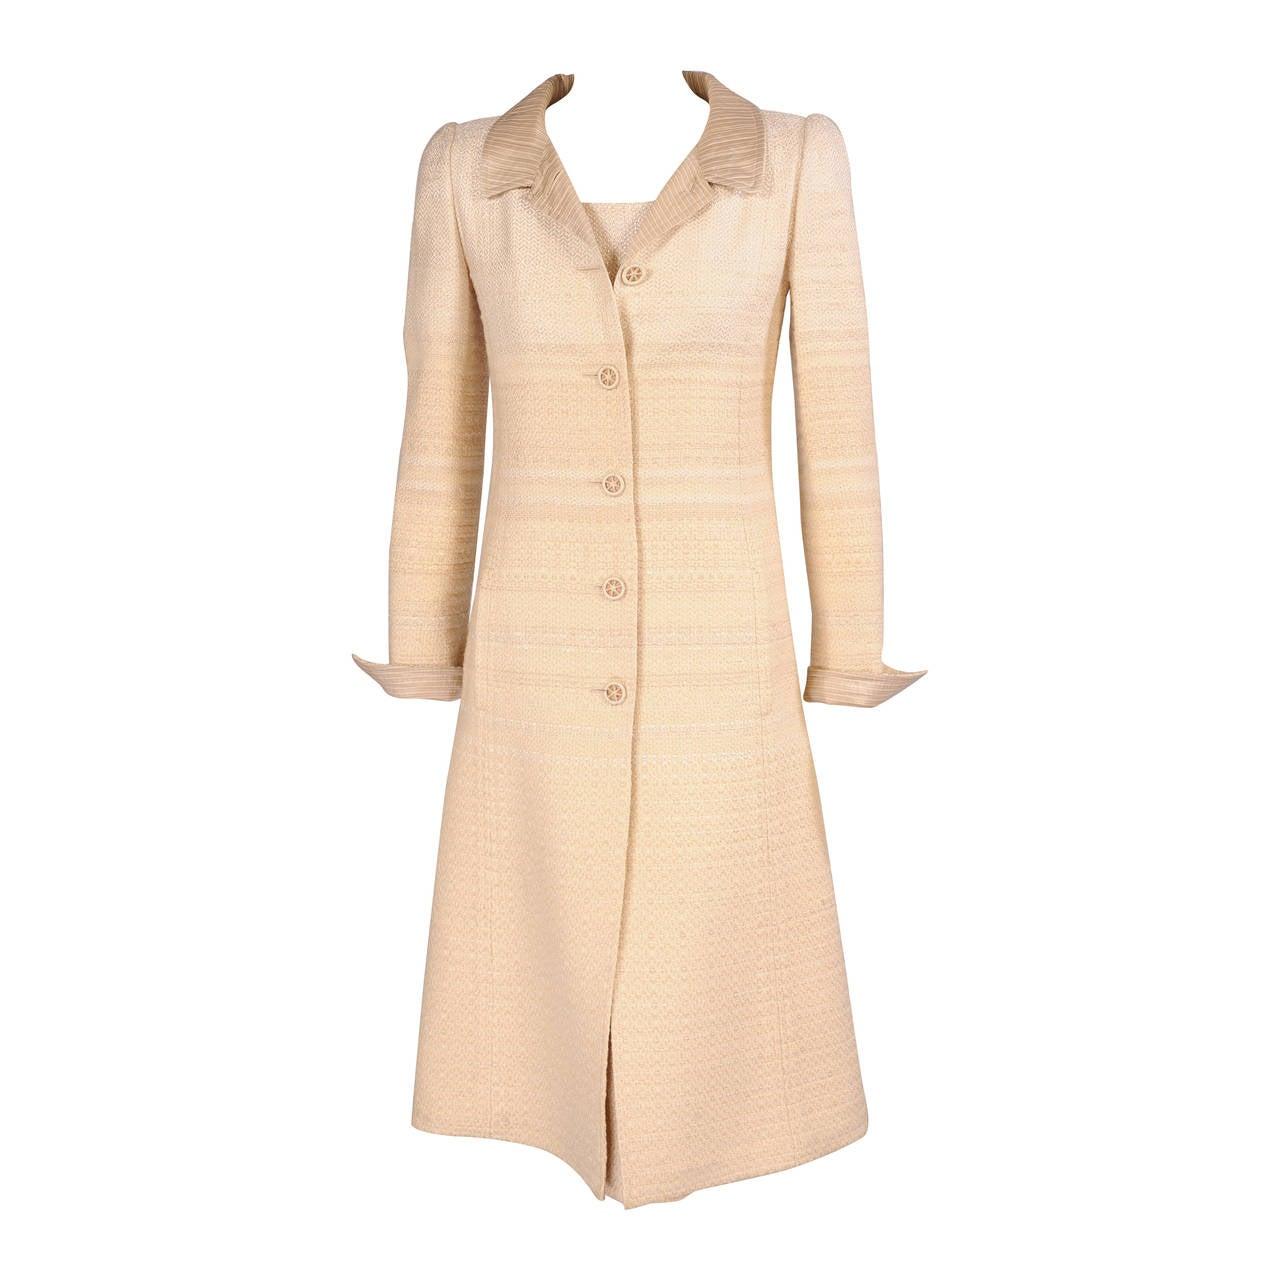 Pierre Balmain Haute Couture Coat & Dress Ensemble Hand Loomed Wool & Silk